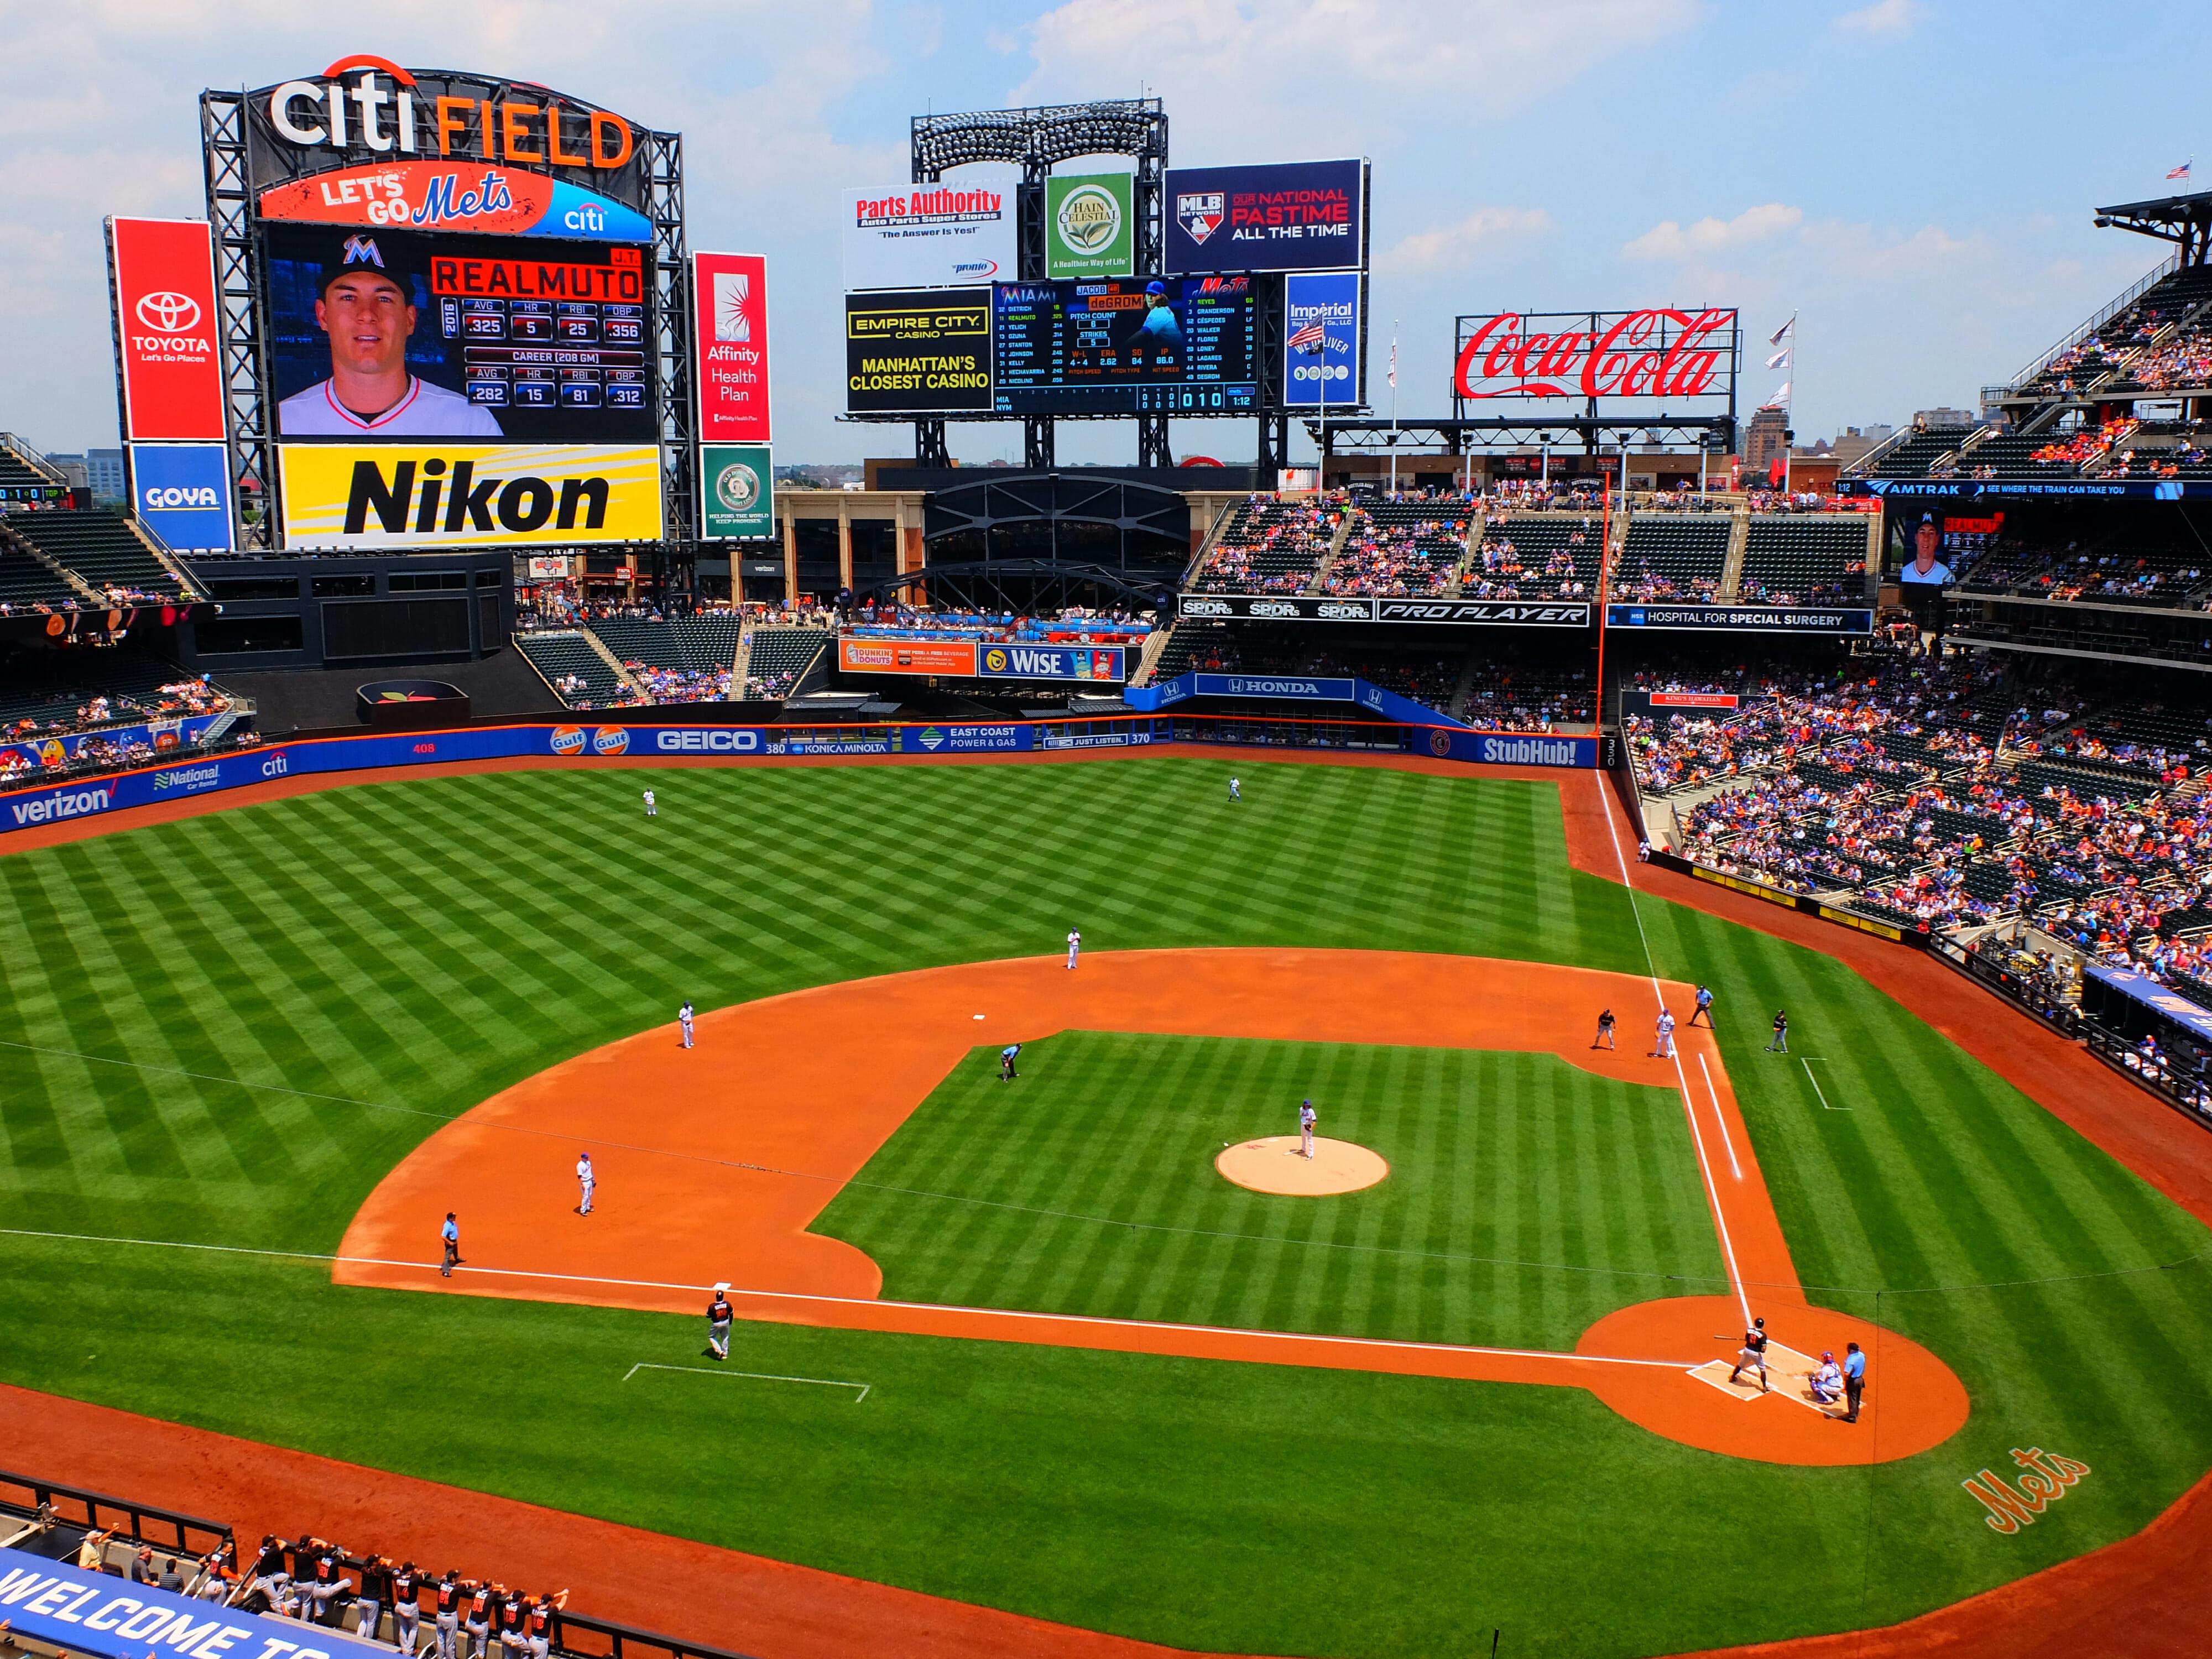 New York Mets Baseball High Quality Wallpaper